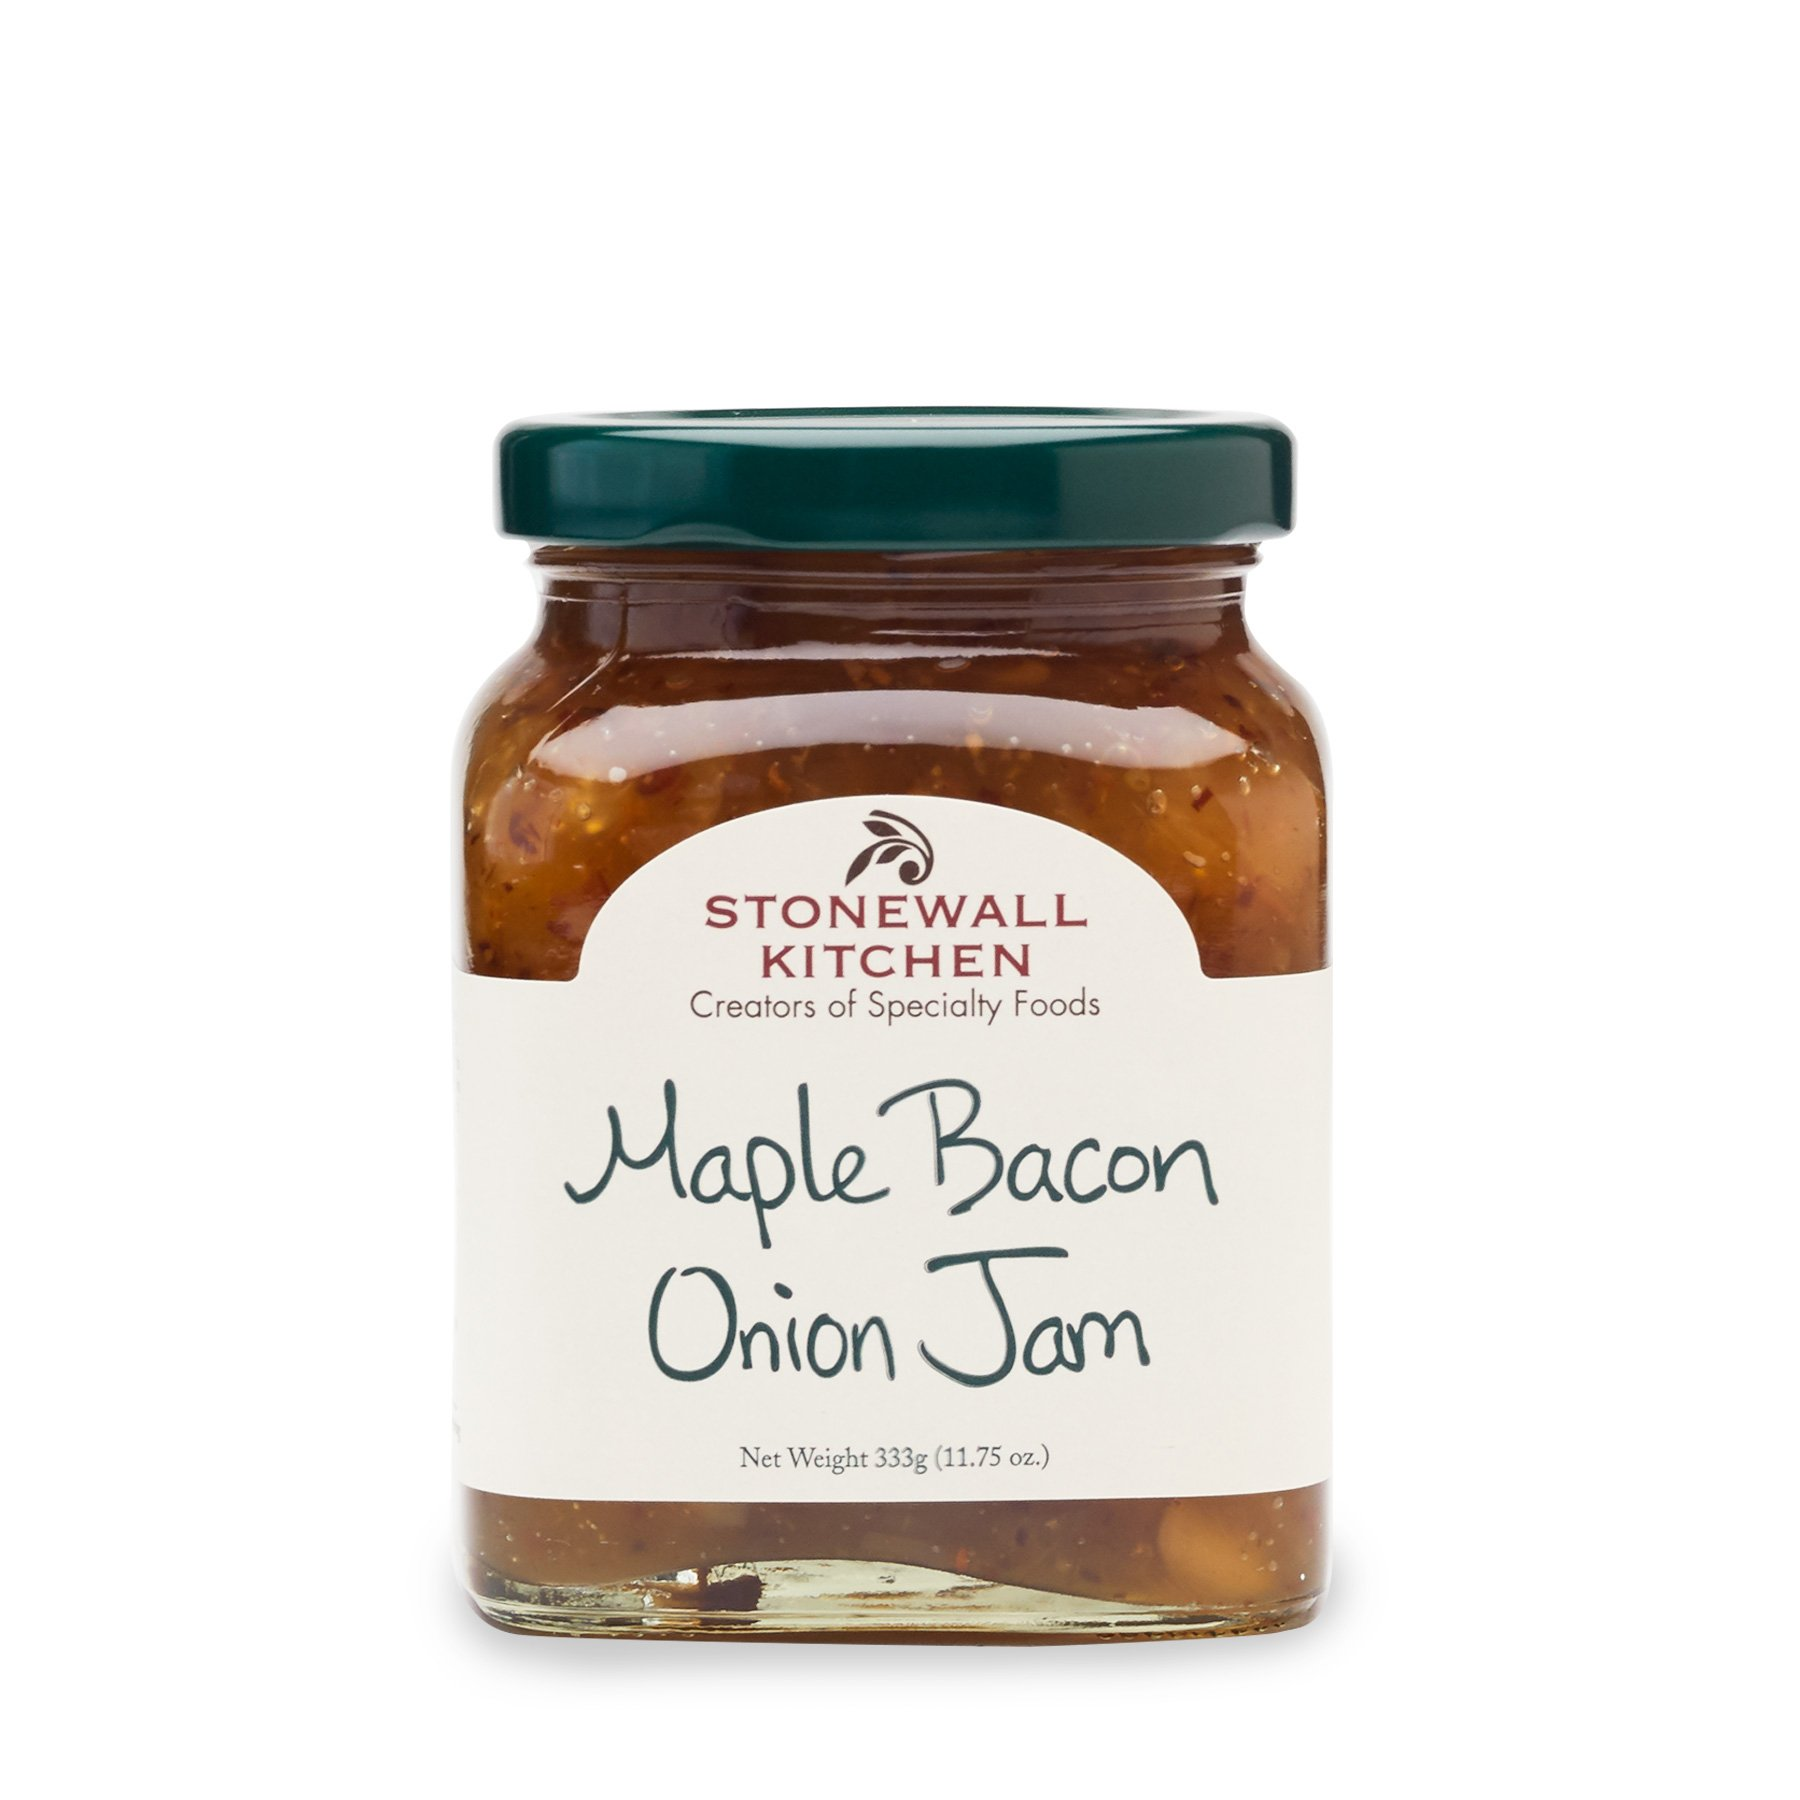 Amazon.com : Stonewall Kitchen Bacon Gift Set : Grocery & Gourmet Food